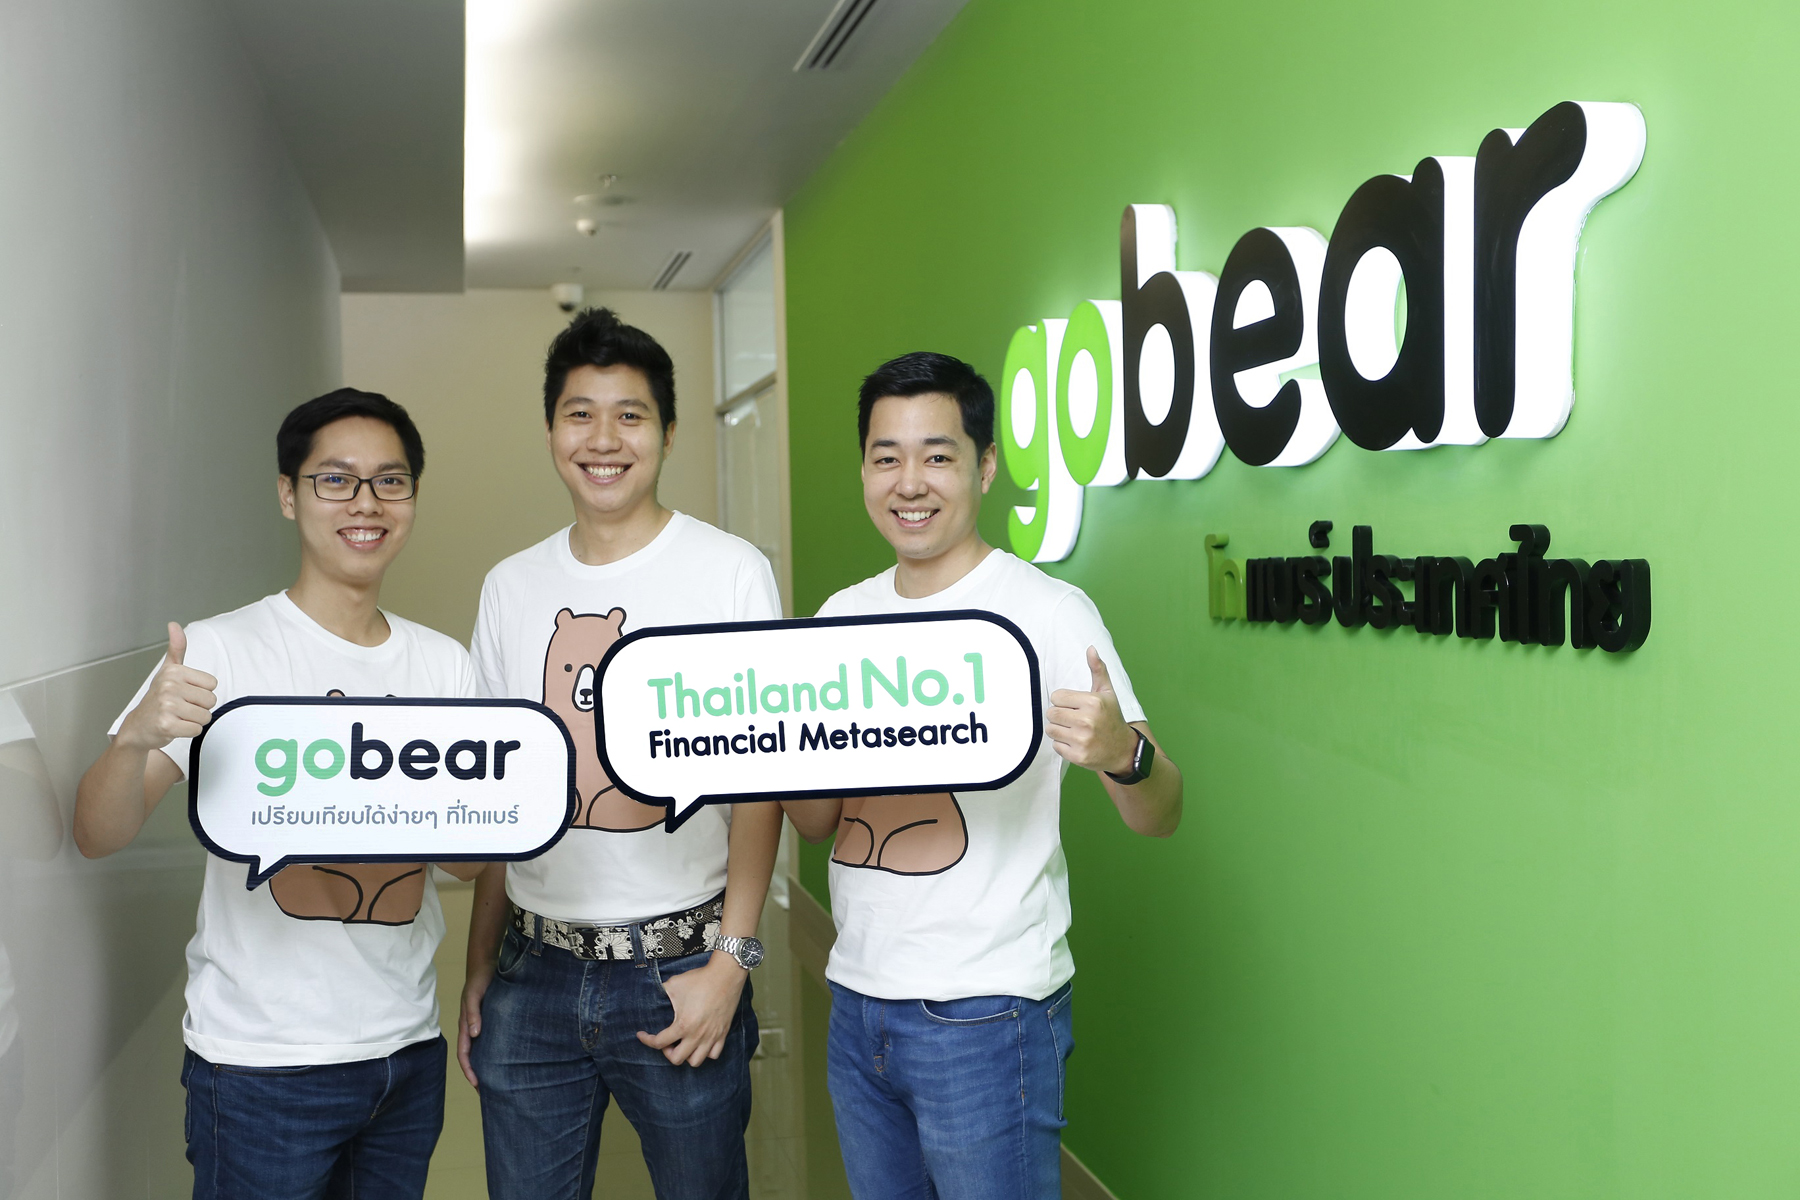 GoBear ฉลองยอดผู้ใช้ทะลุ 3.6 ล้านคน_3